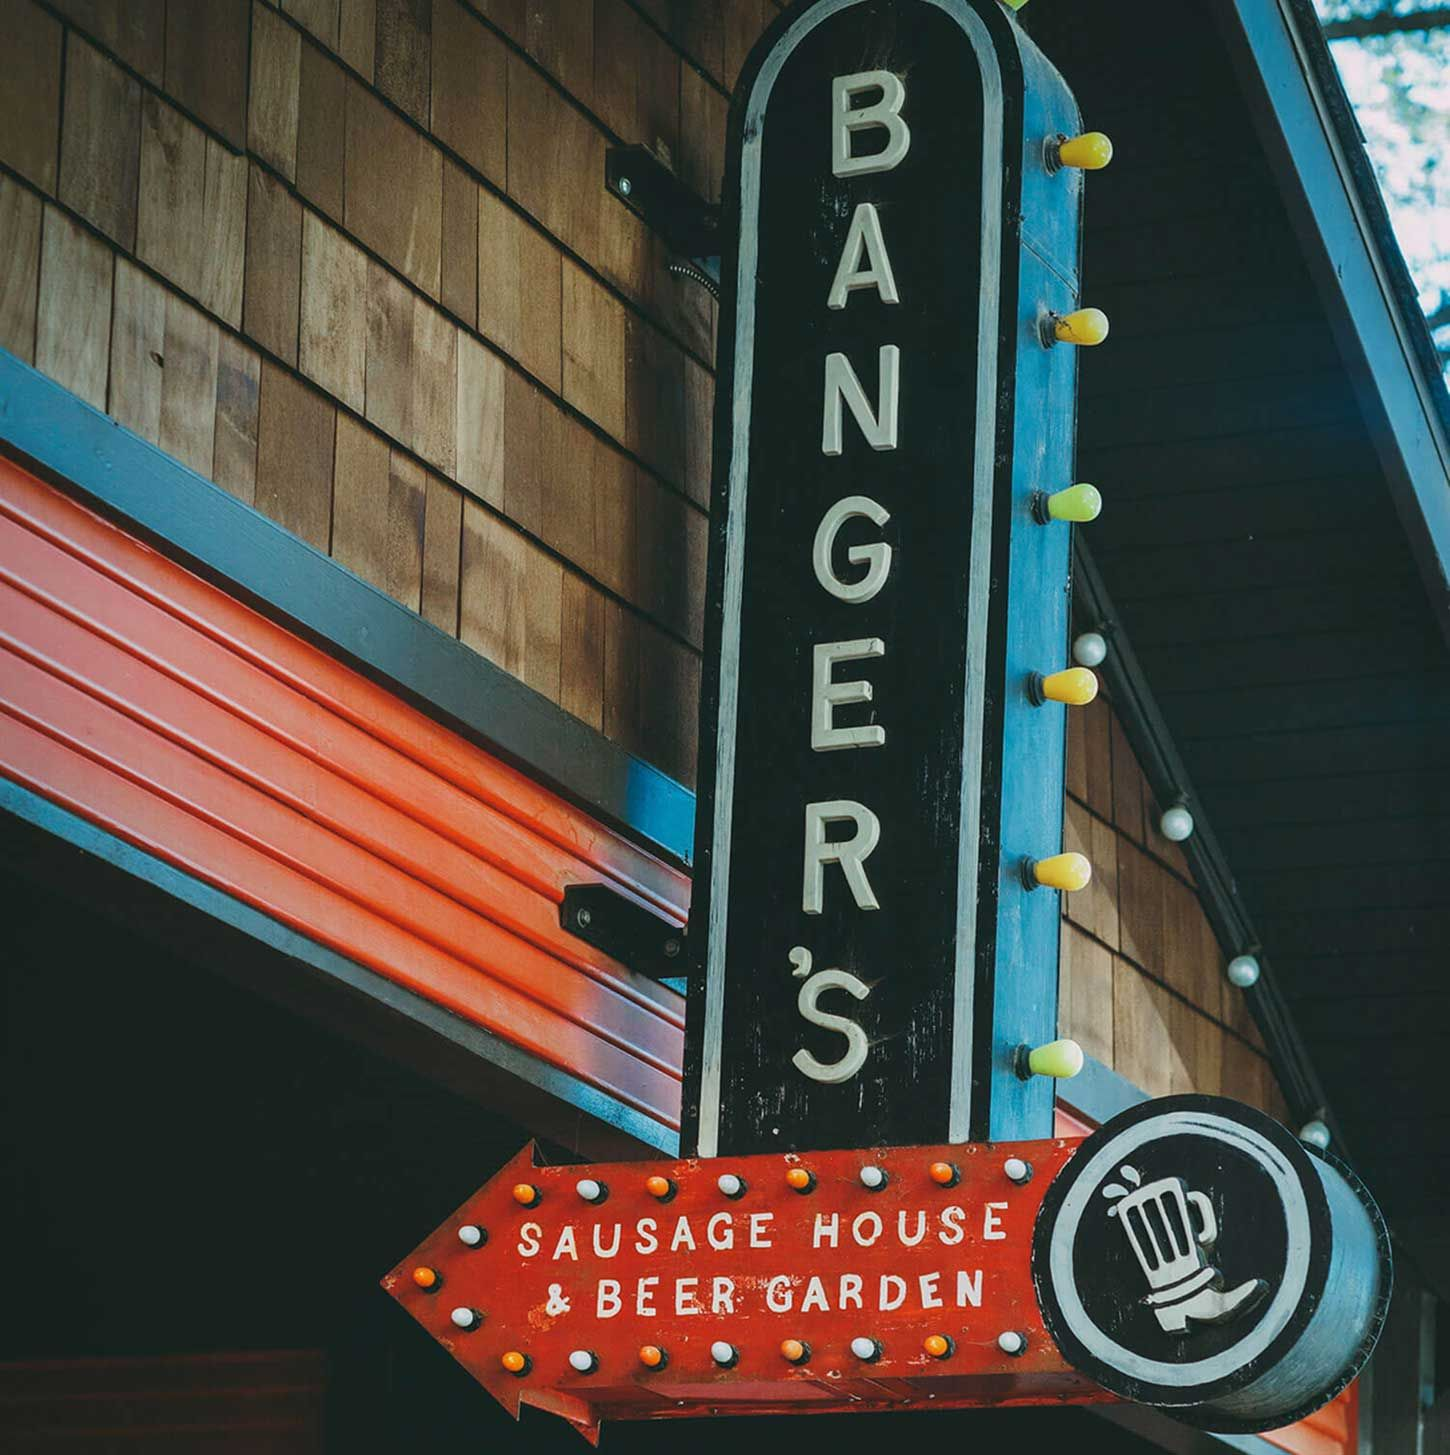 Banger's German Food and Drinks Austin